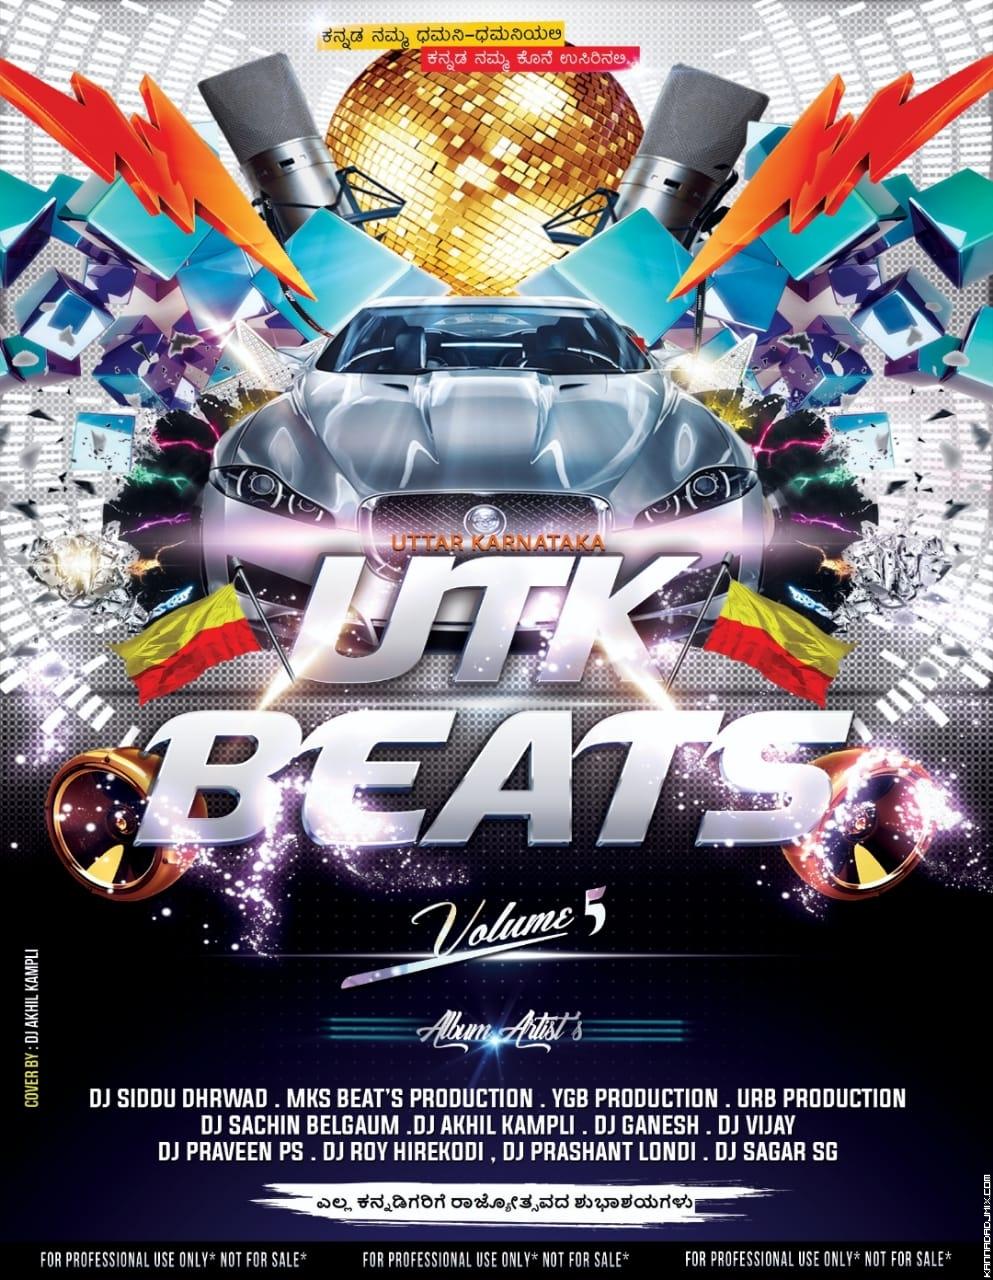 JEEVA KANNADA DEV EDM DROP DJ PRAVEEN PS DJ SAGAR SG DANDELI.mp3